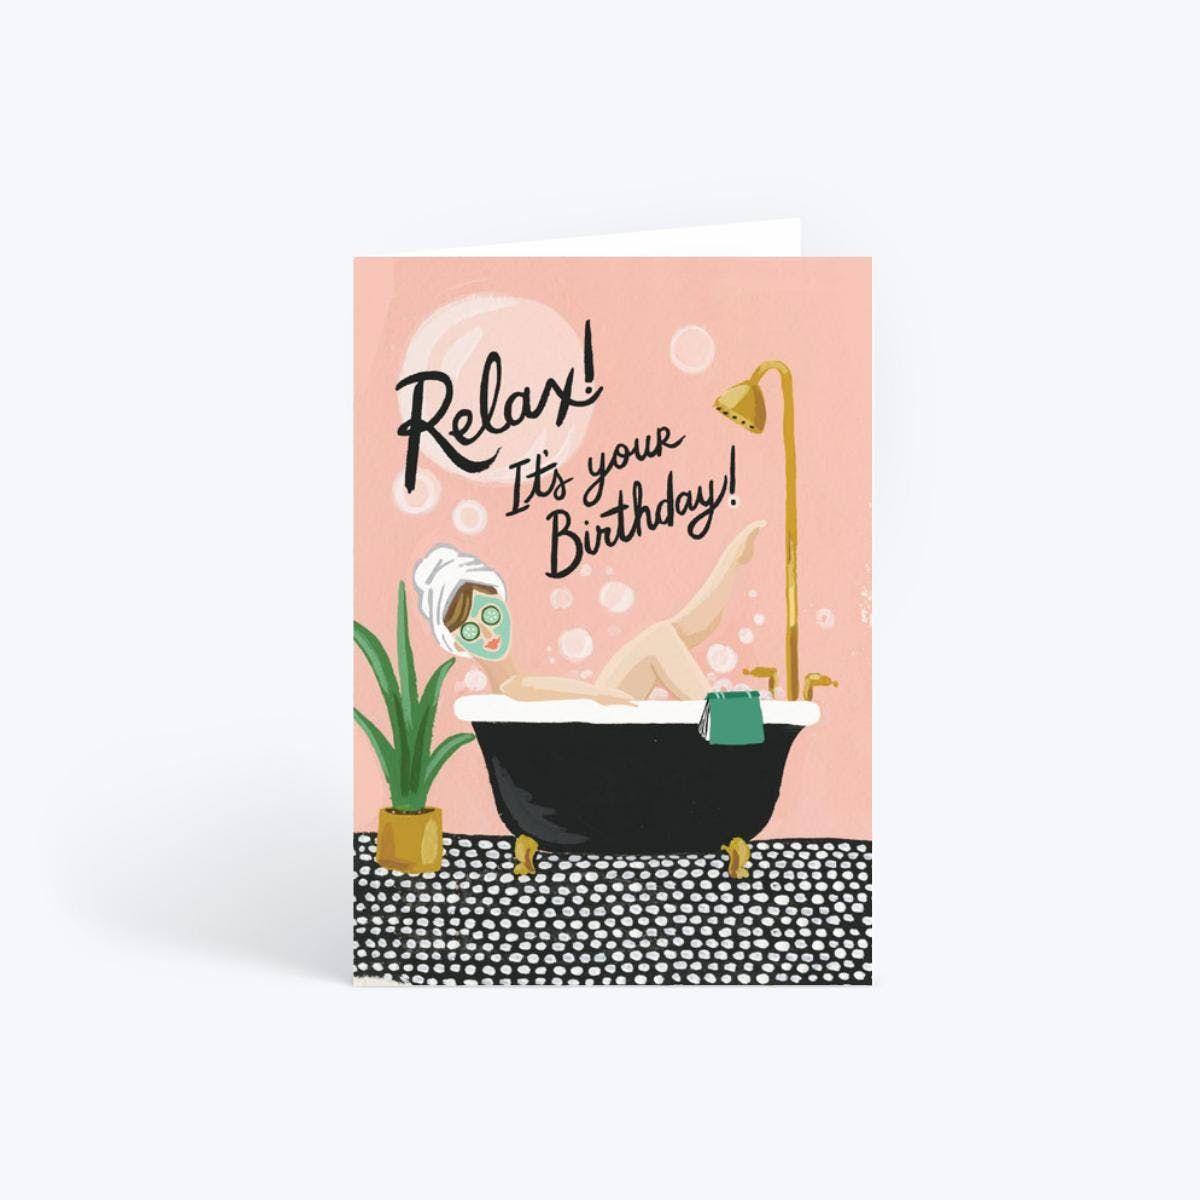 Bubble Bath Relax Birthday Card Birthday Card Design Birthday Cards Cool Birthday Cards